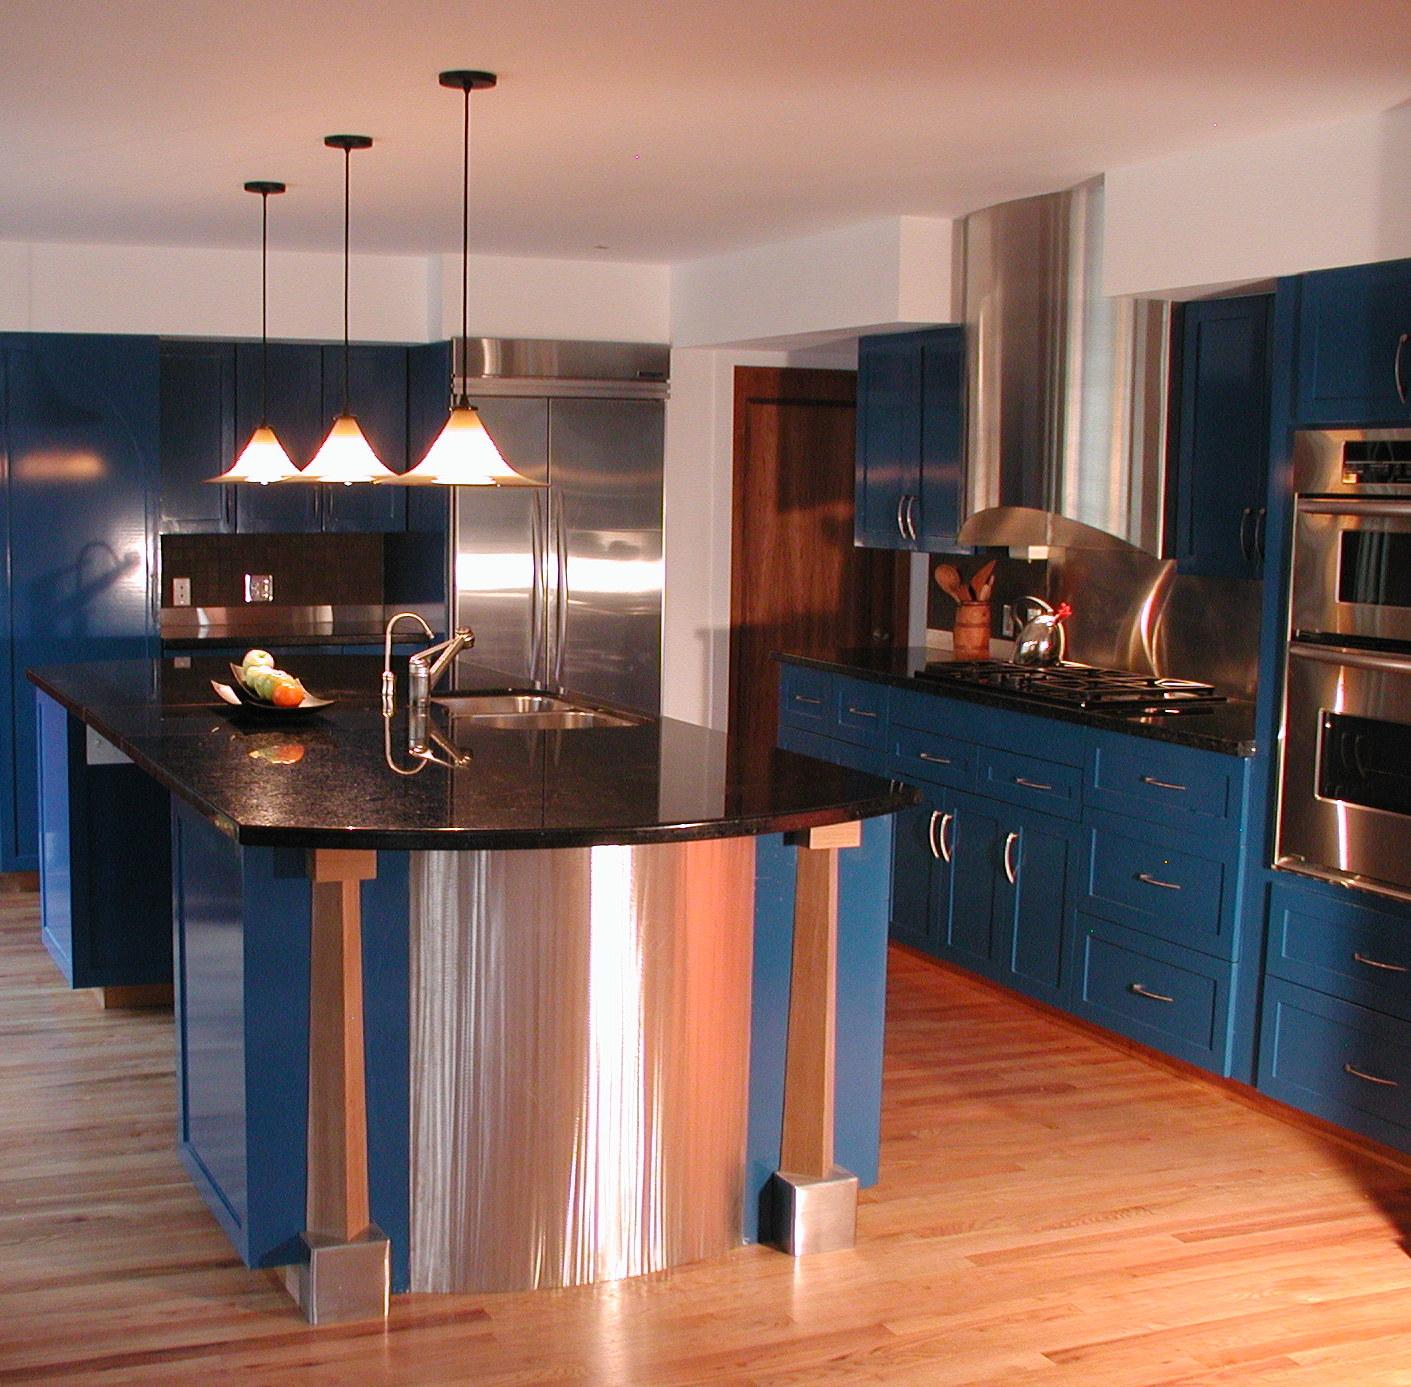 Bolane Interior Kitchen 4 better.JPG